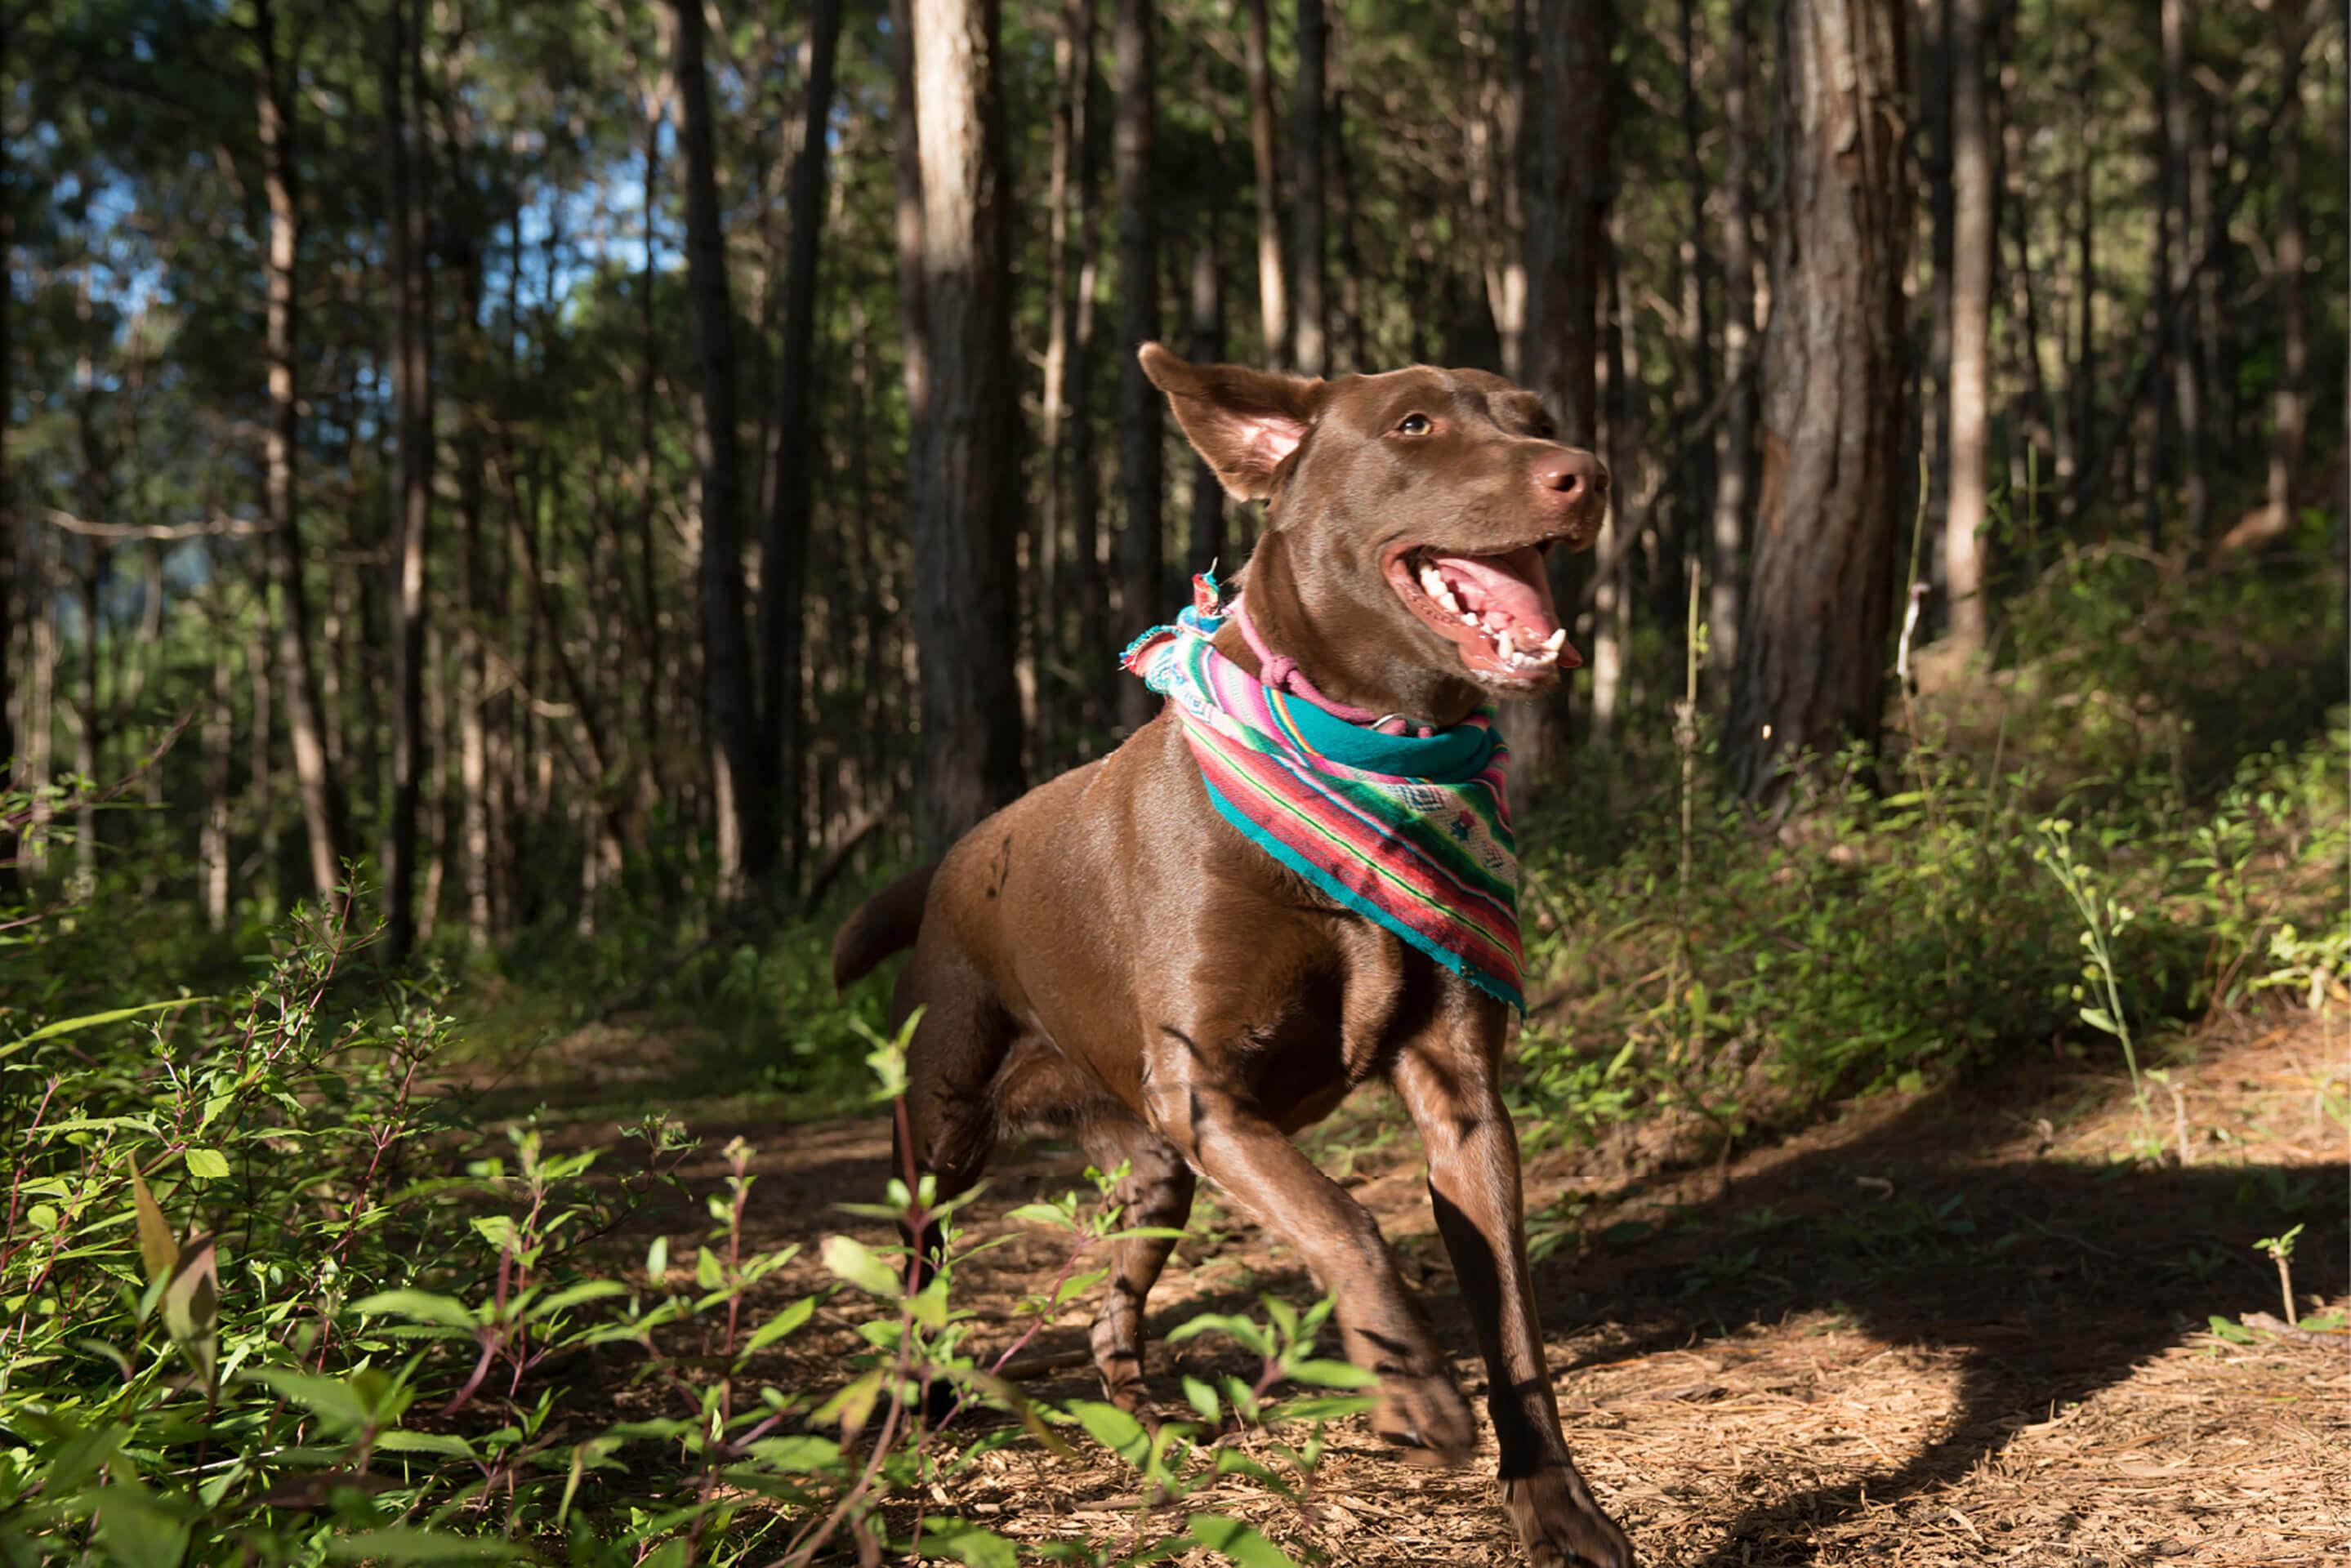 CCT founder JP Alipio's dog Pacha running through the forests